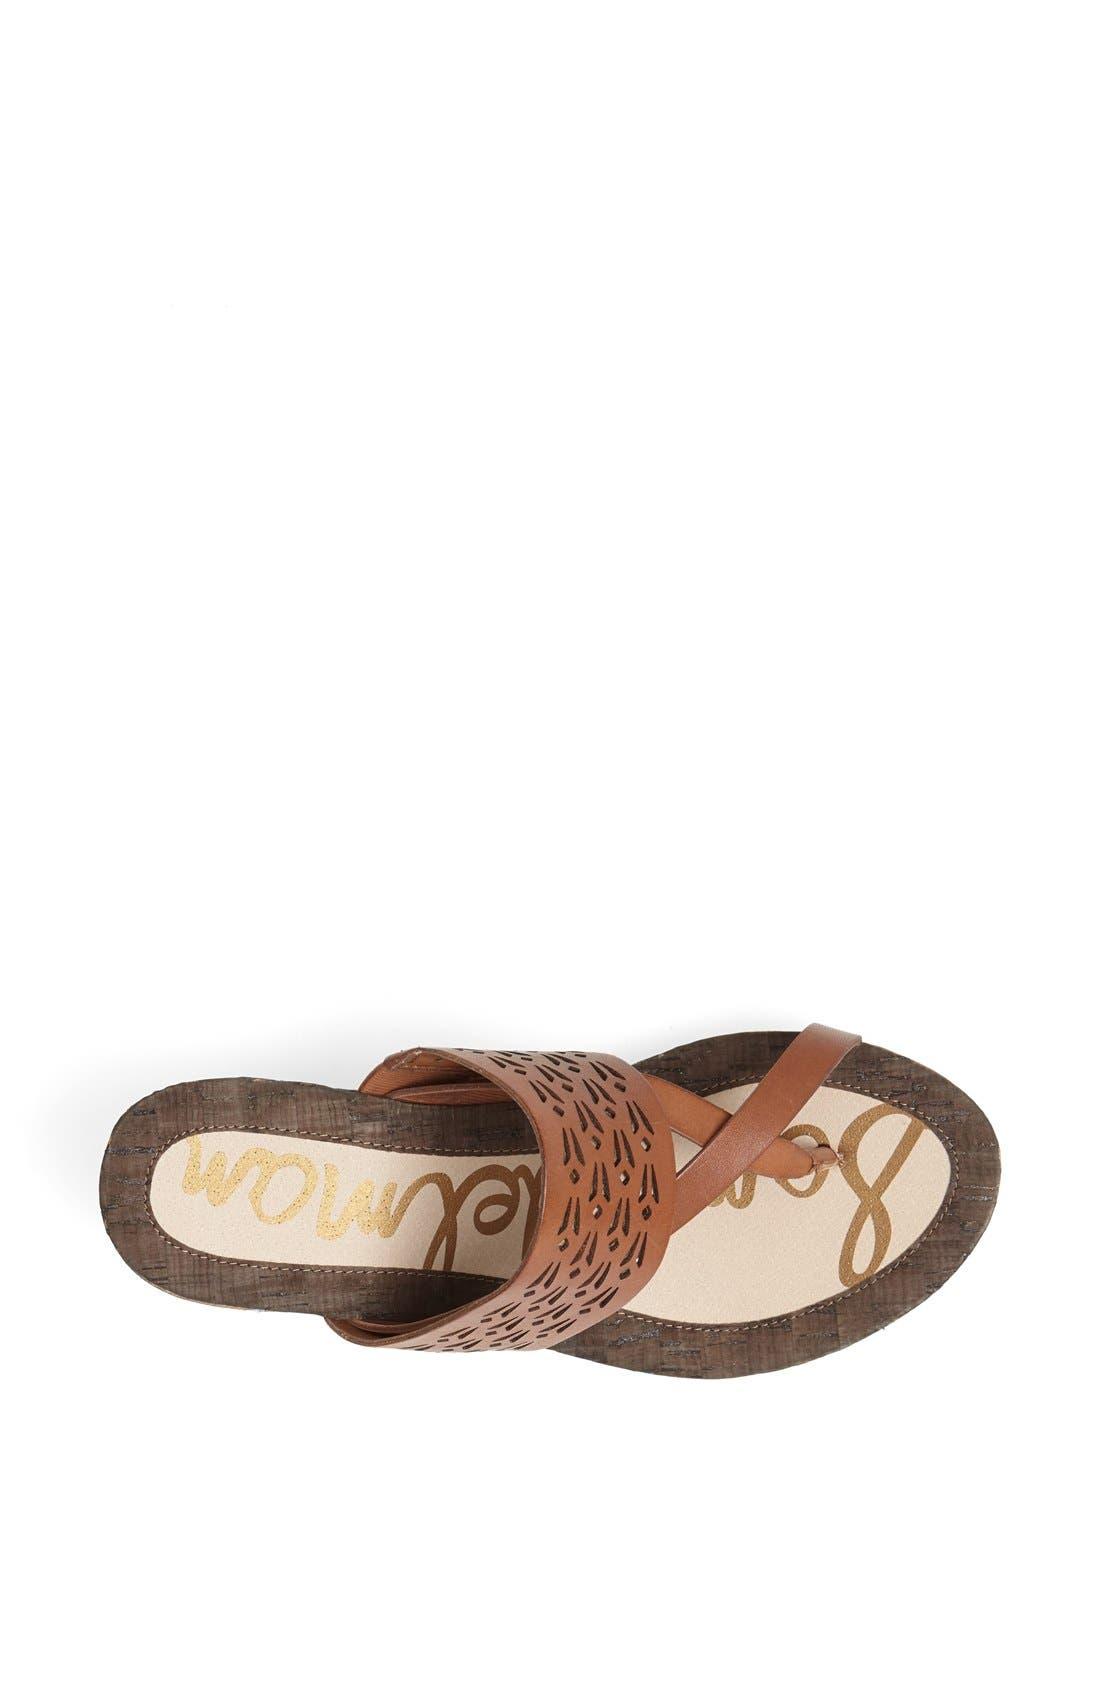 Alternate Image 3  - Sam Edelman 'Nylee' Wedge Sandal